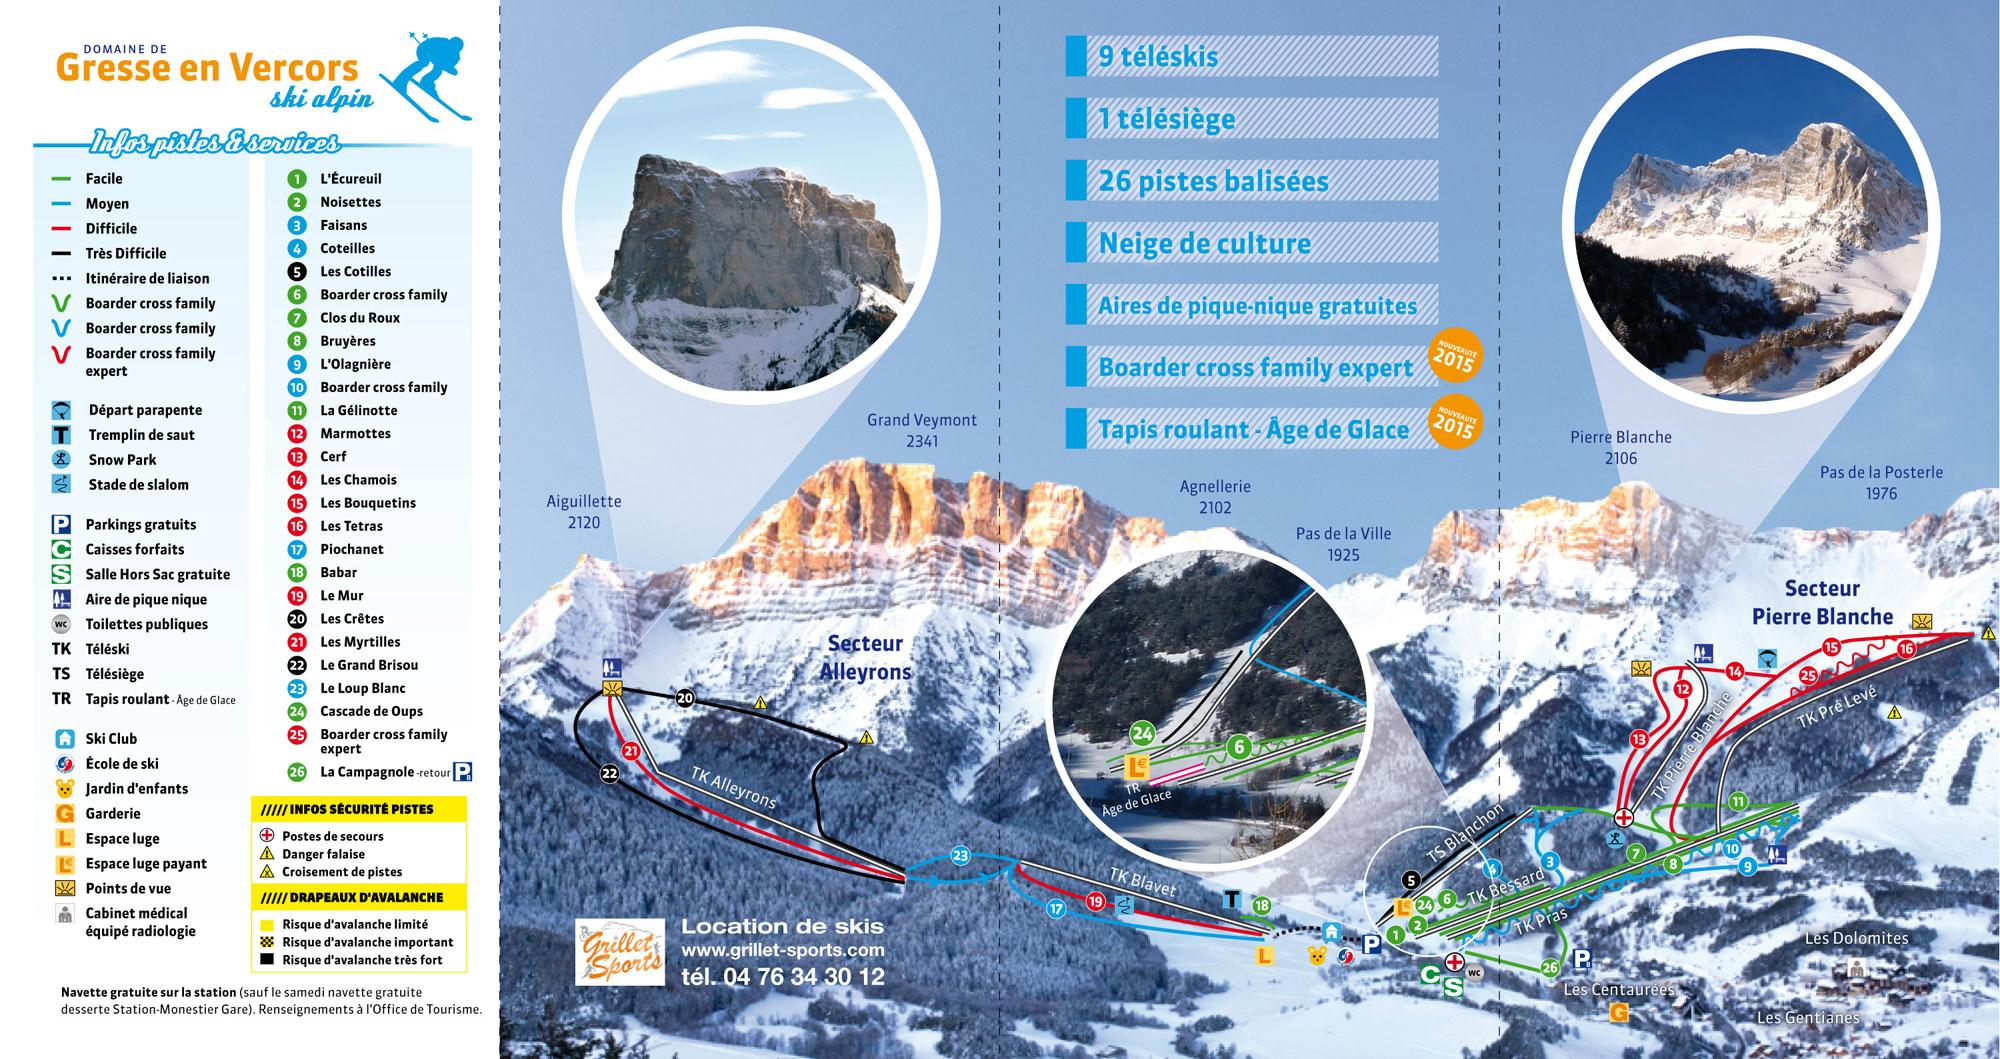 Location gresse en vercors 3397 locations la neige - Office du tourisme gresse en vercors ...